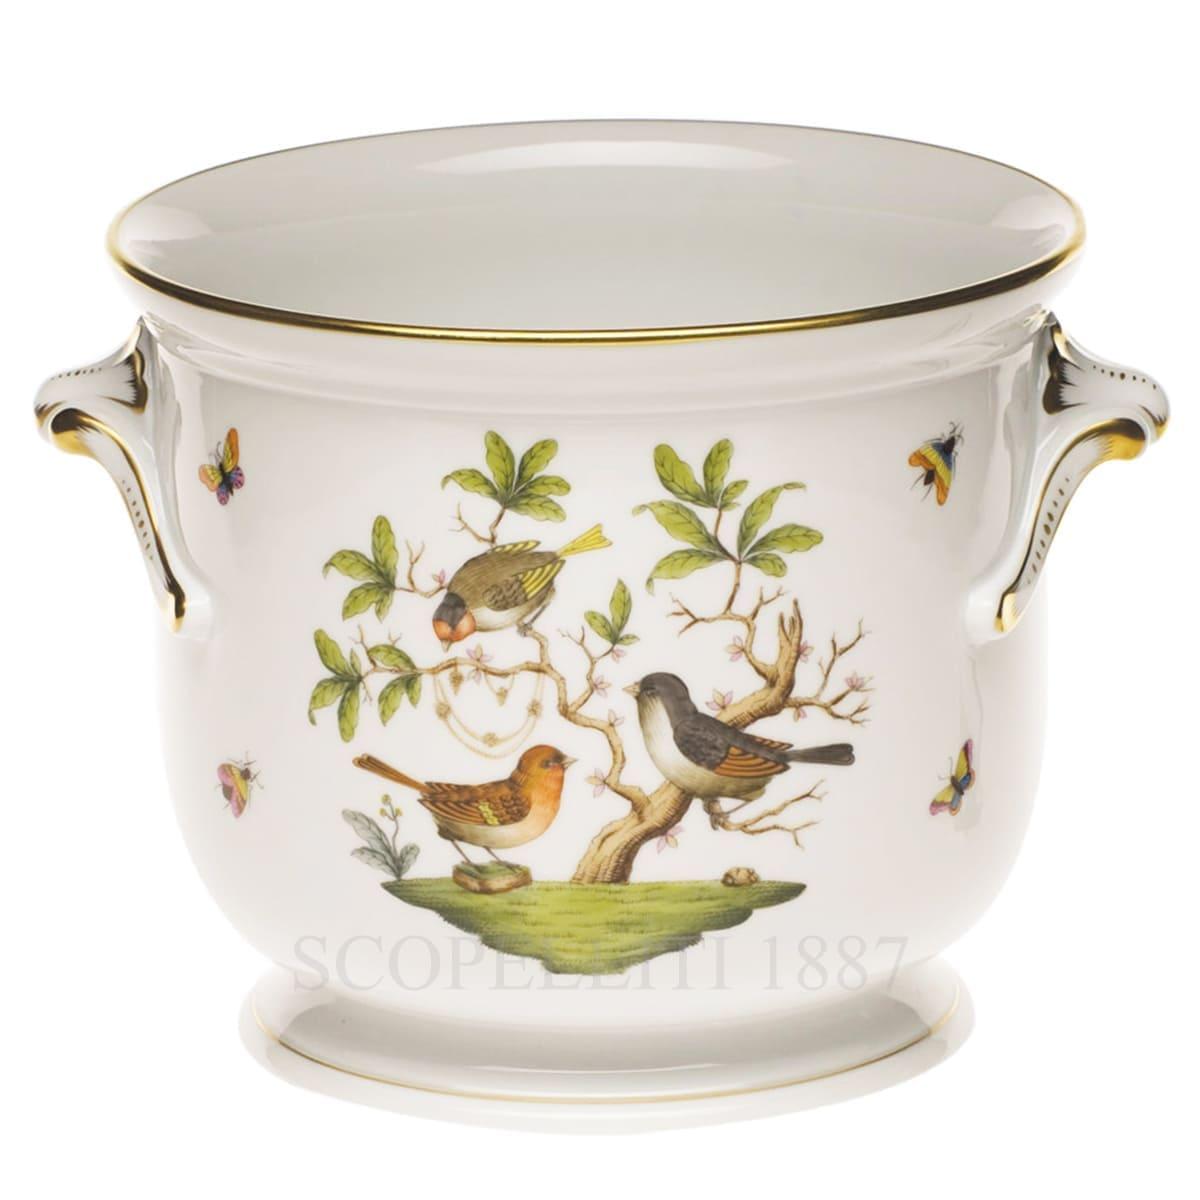 herend porcelain rothschild cachepot